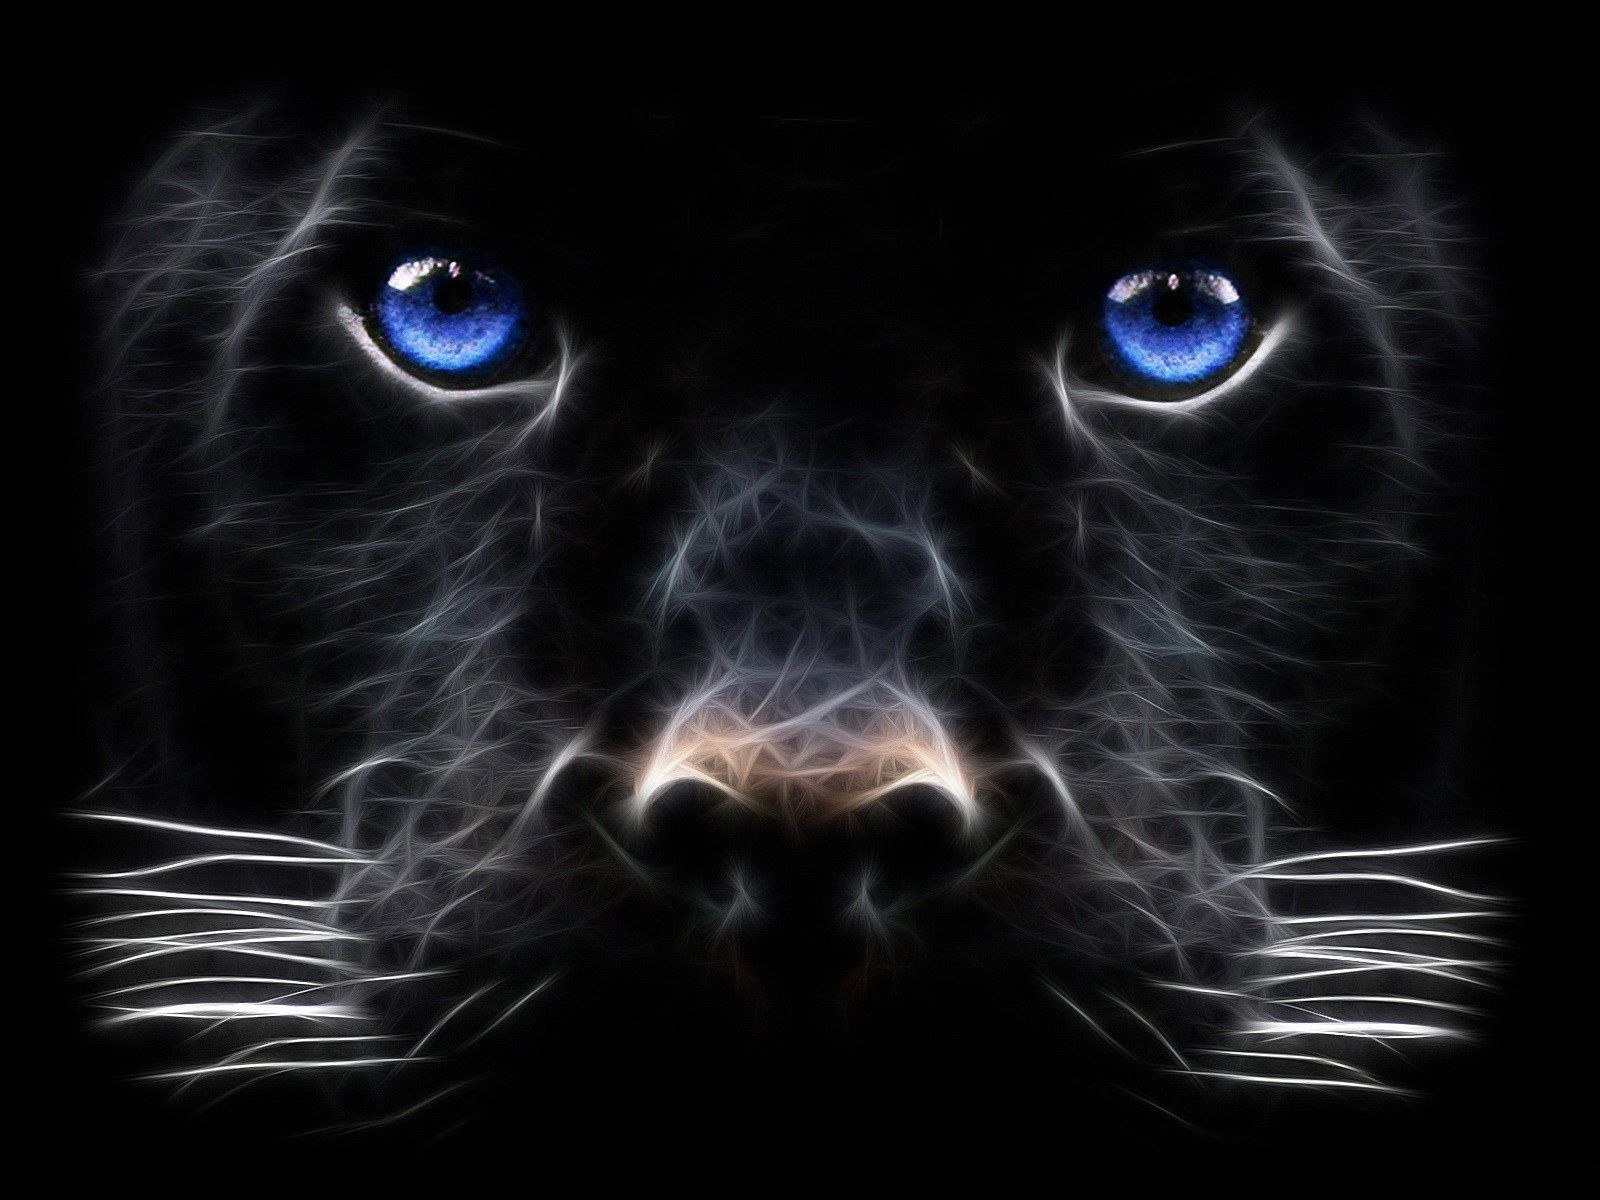 Image detail for Black Panther Animals Wallpaper